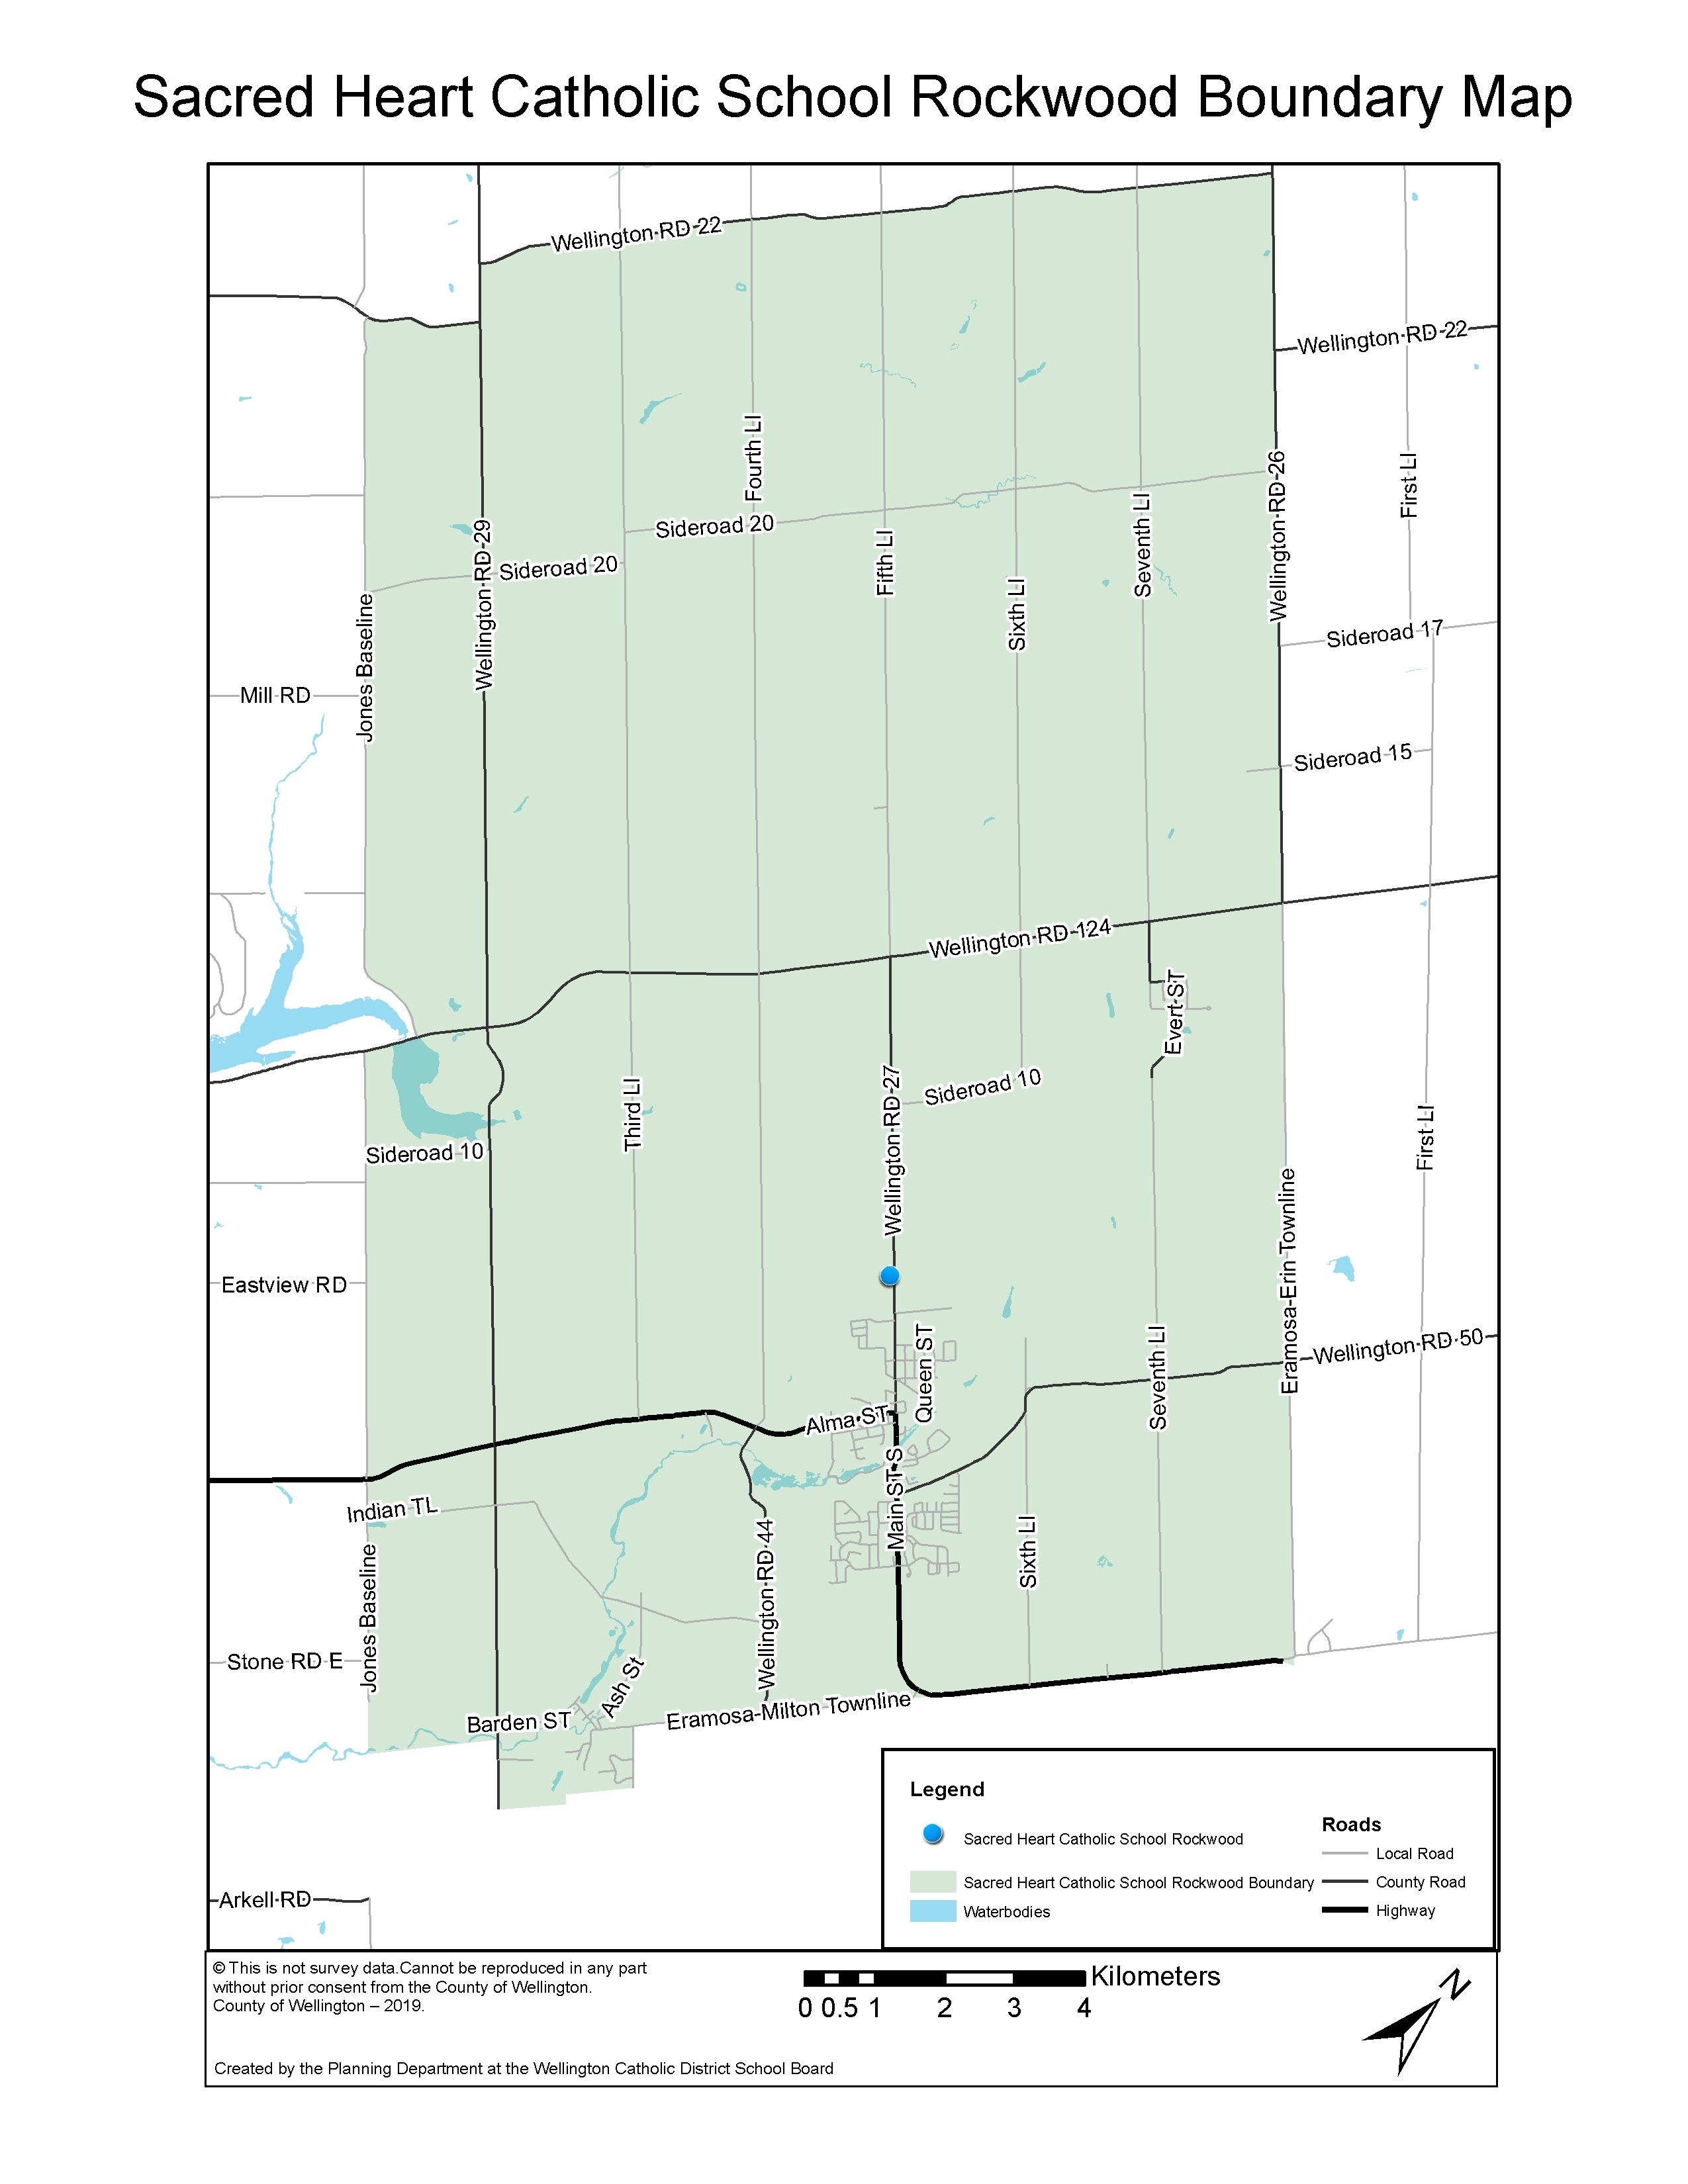 Rockwood Boundary